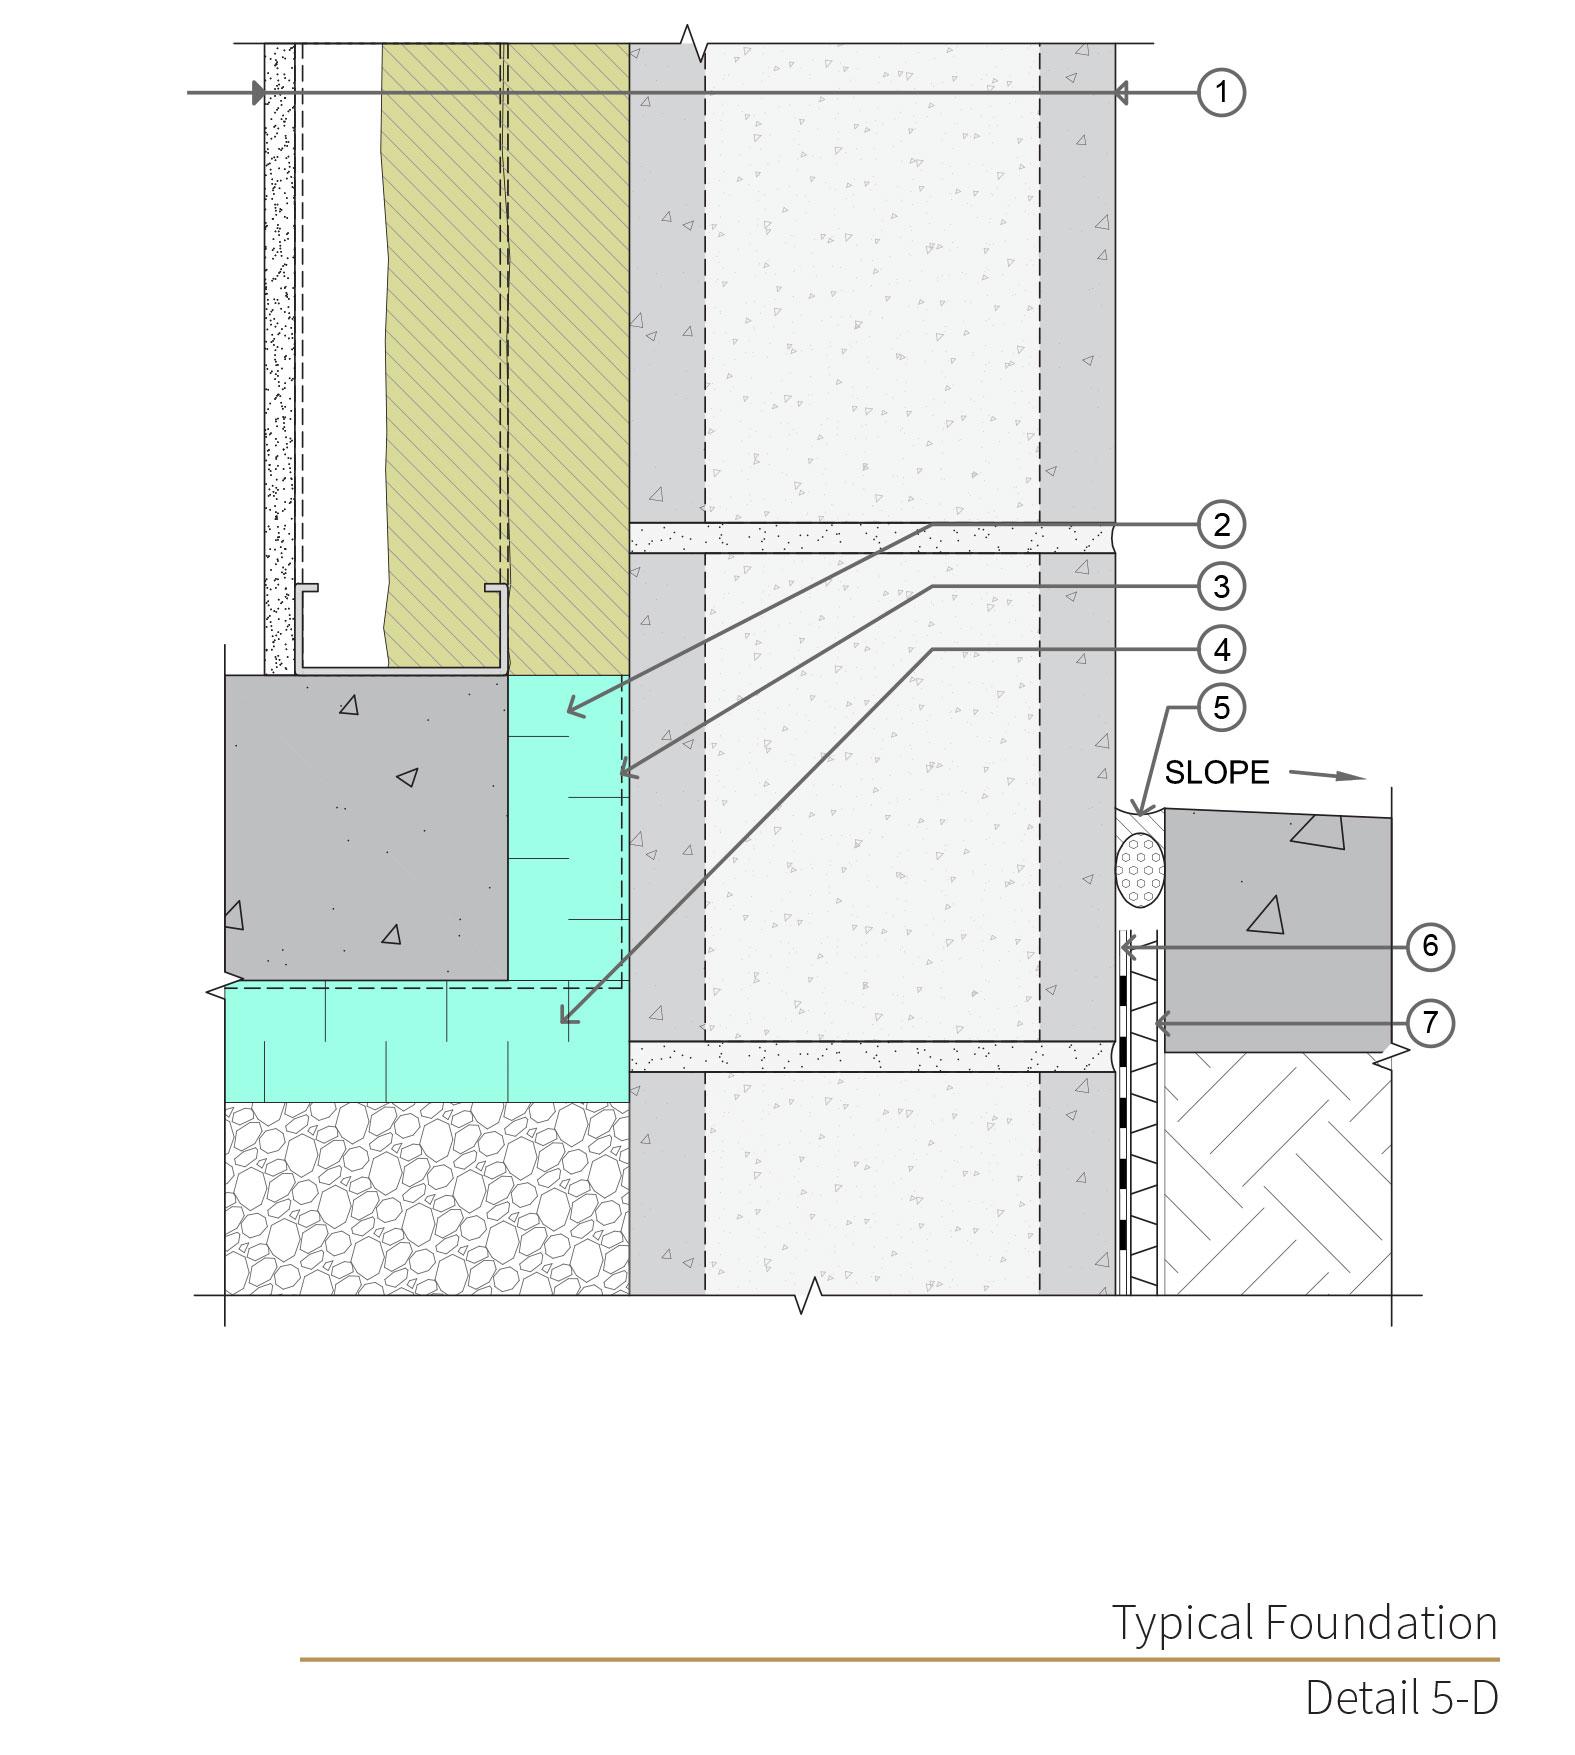 Assembly 5 Detail 5D